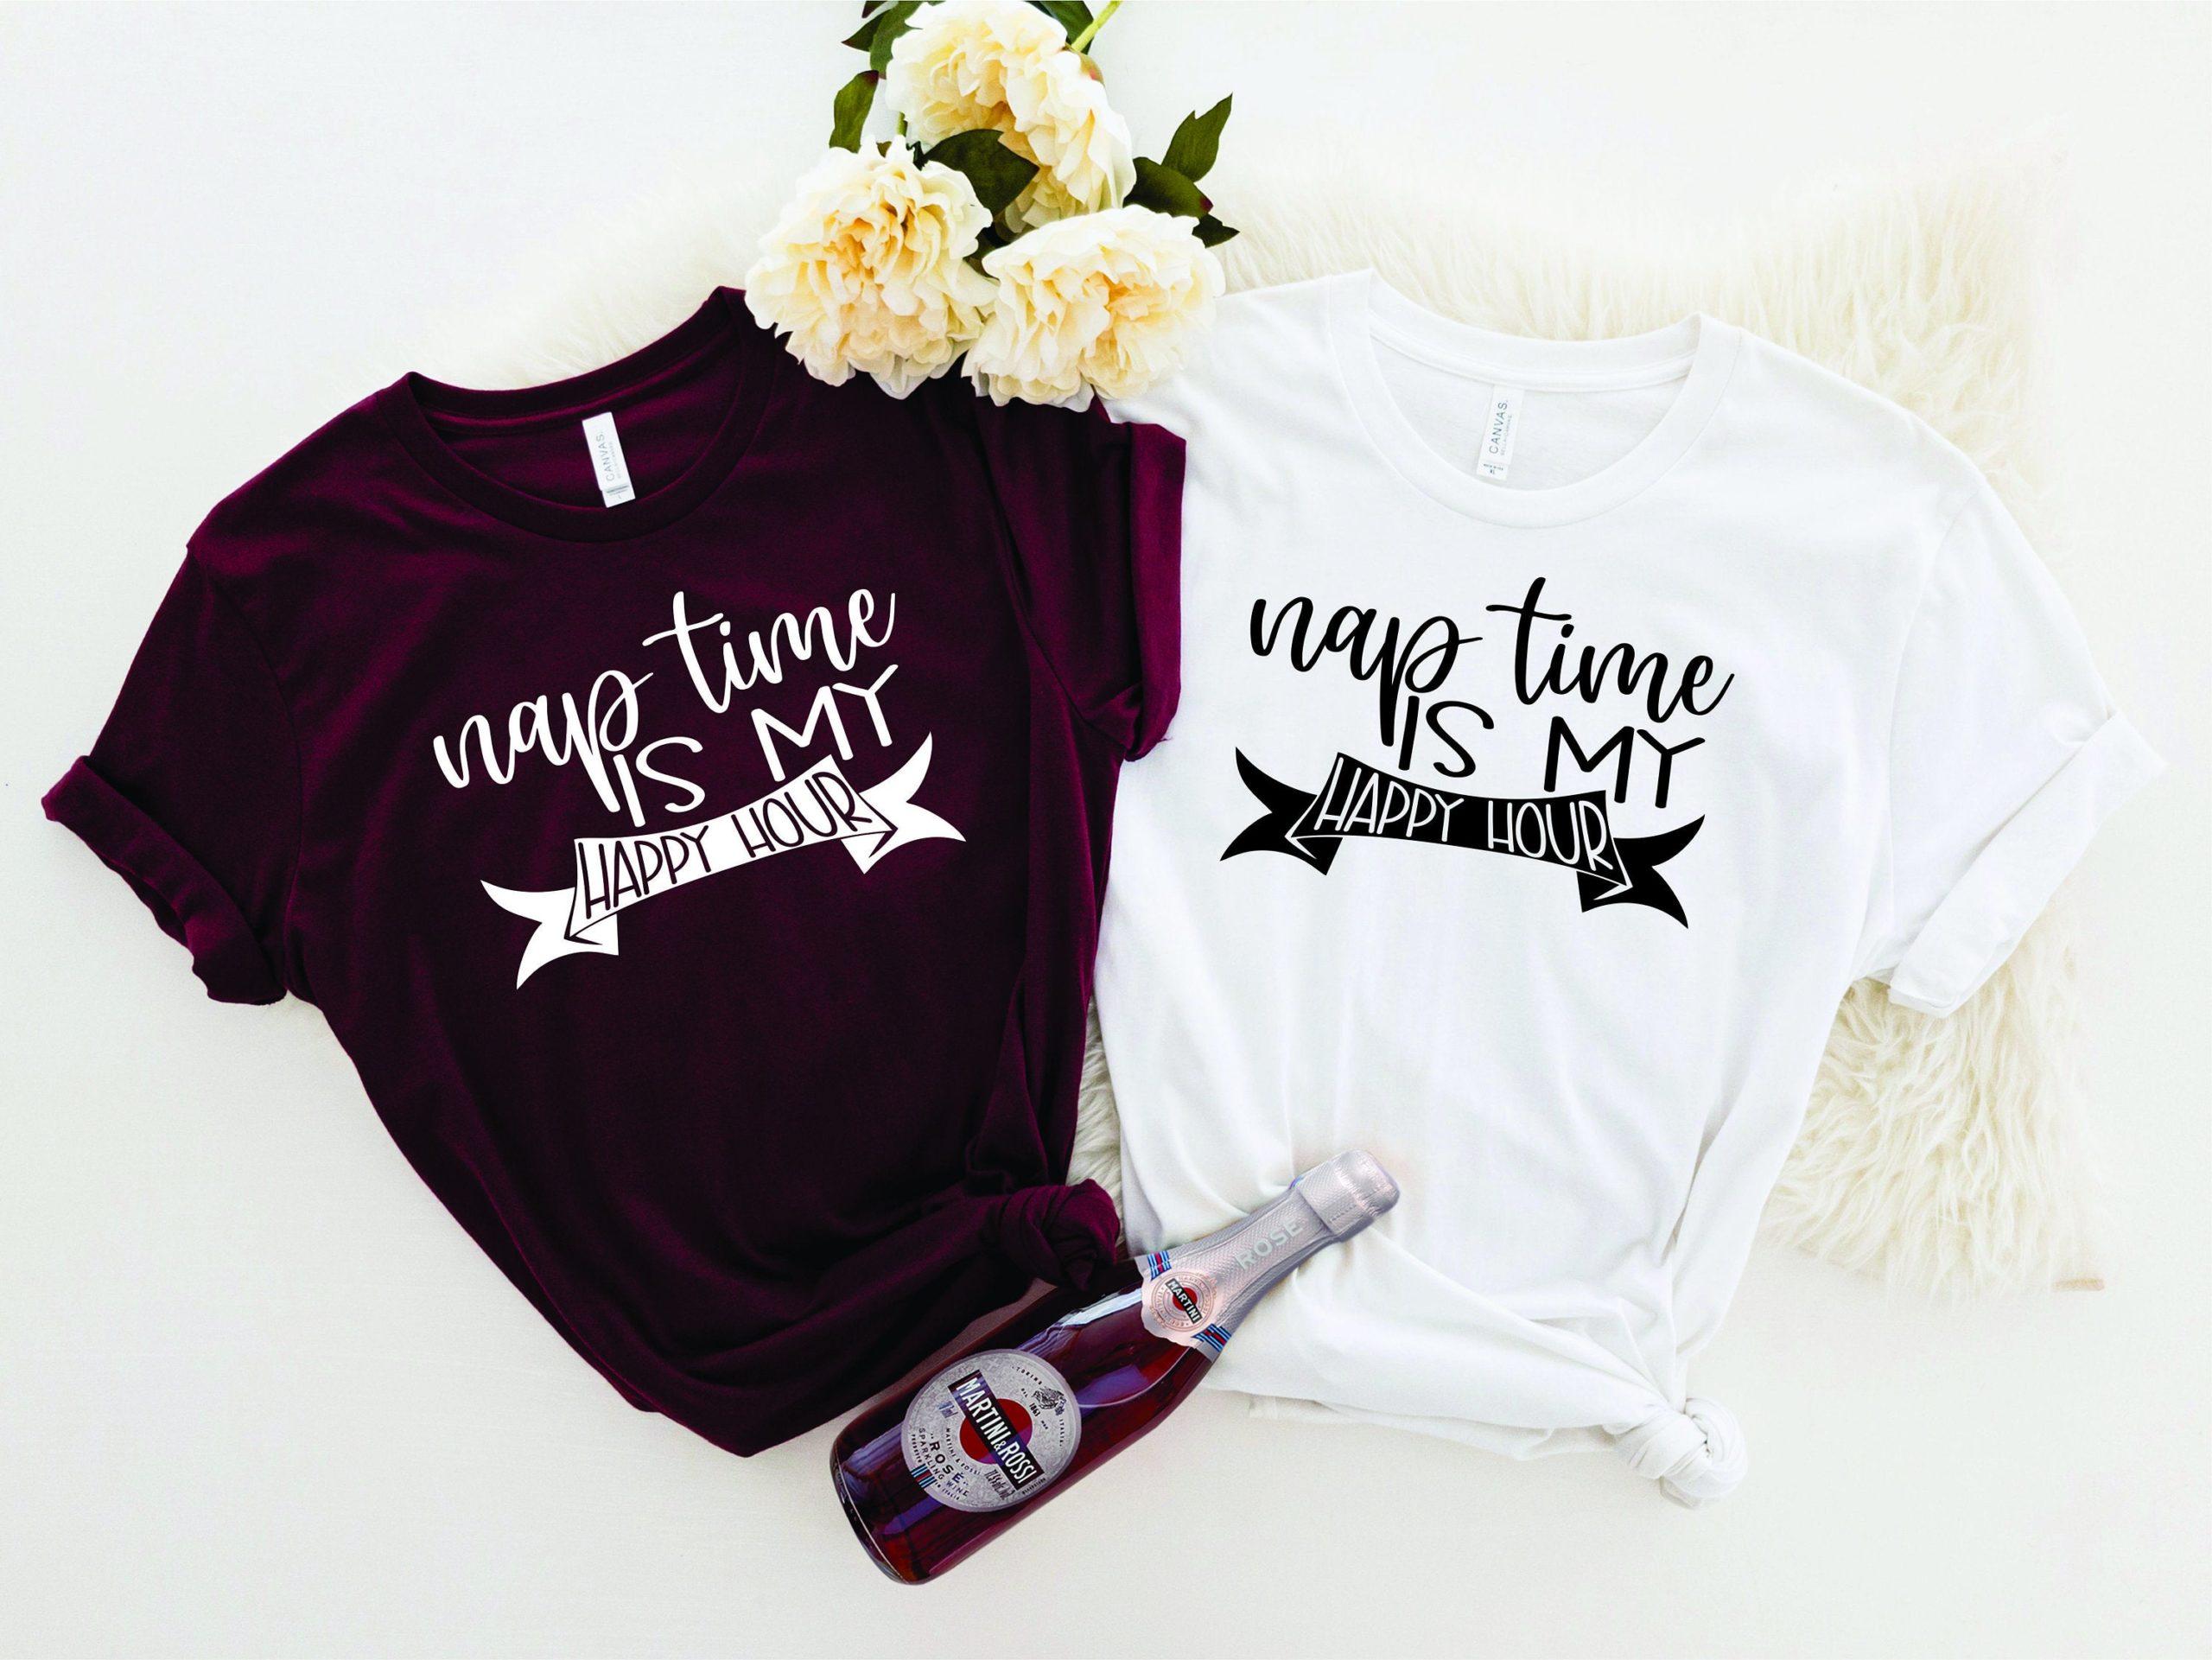 Nap-time-is-my-happy-hour-svg-mothers-day-svg-girl-mom-svg-boy-mom-svg-mom-quote-svg-motherhood-svg-mothers-day-design-cricut-svg-60514a39